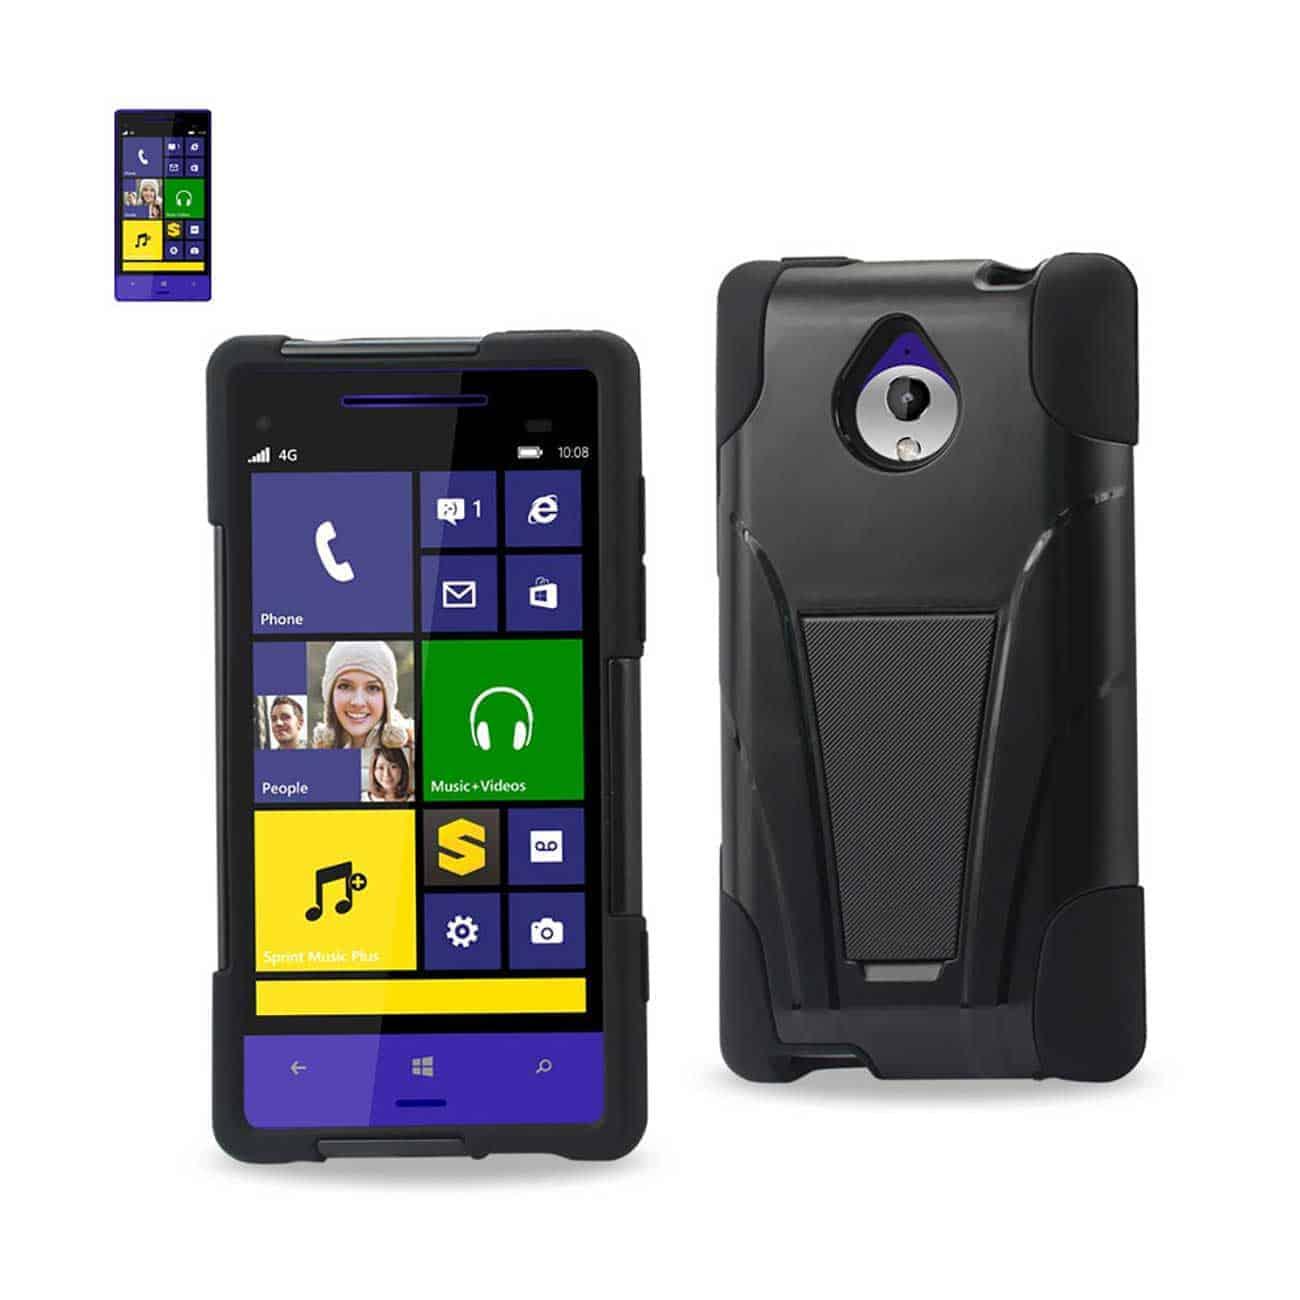 HTC 8XT HYBRID HEAVY DUTY CASE WITH KICKSTAND IN BLACK